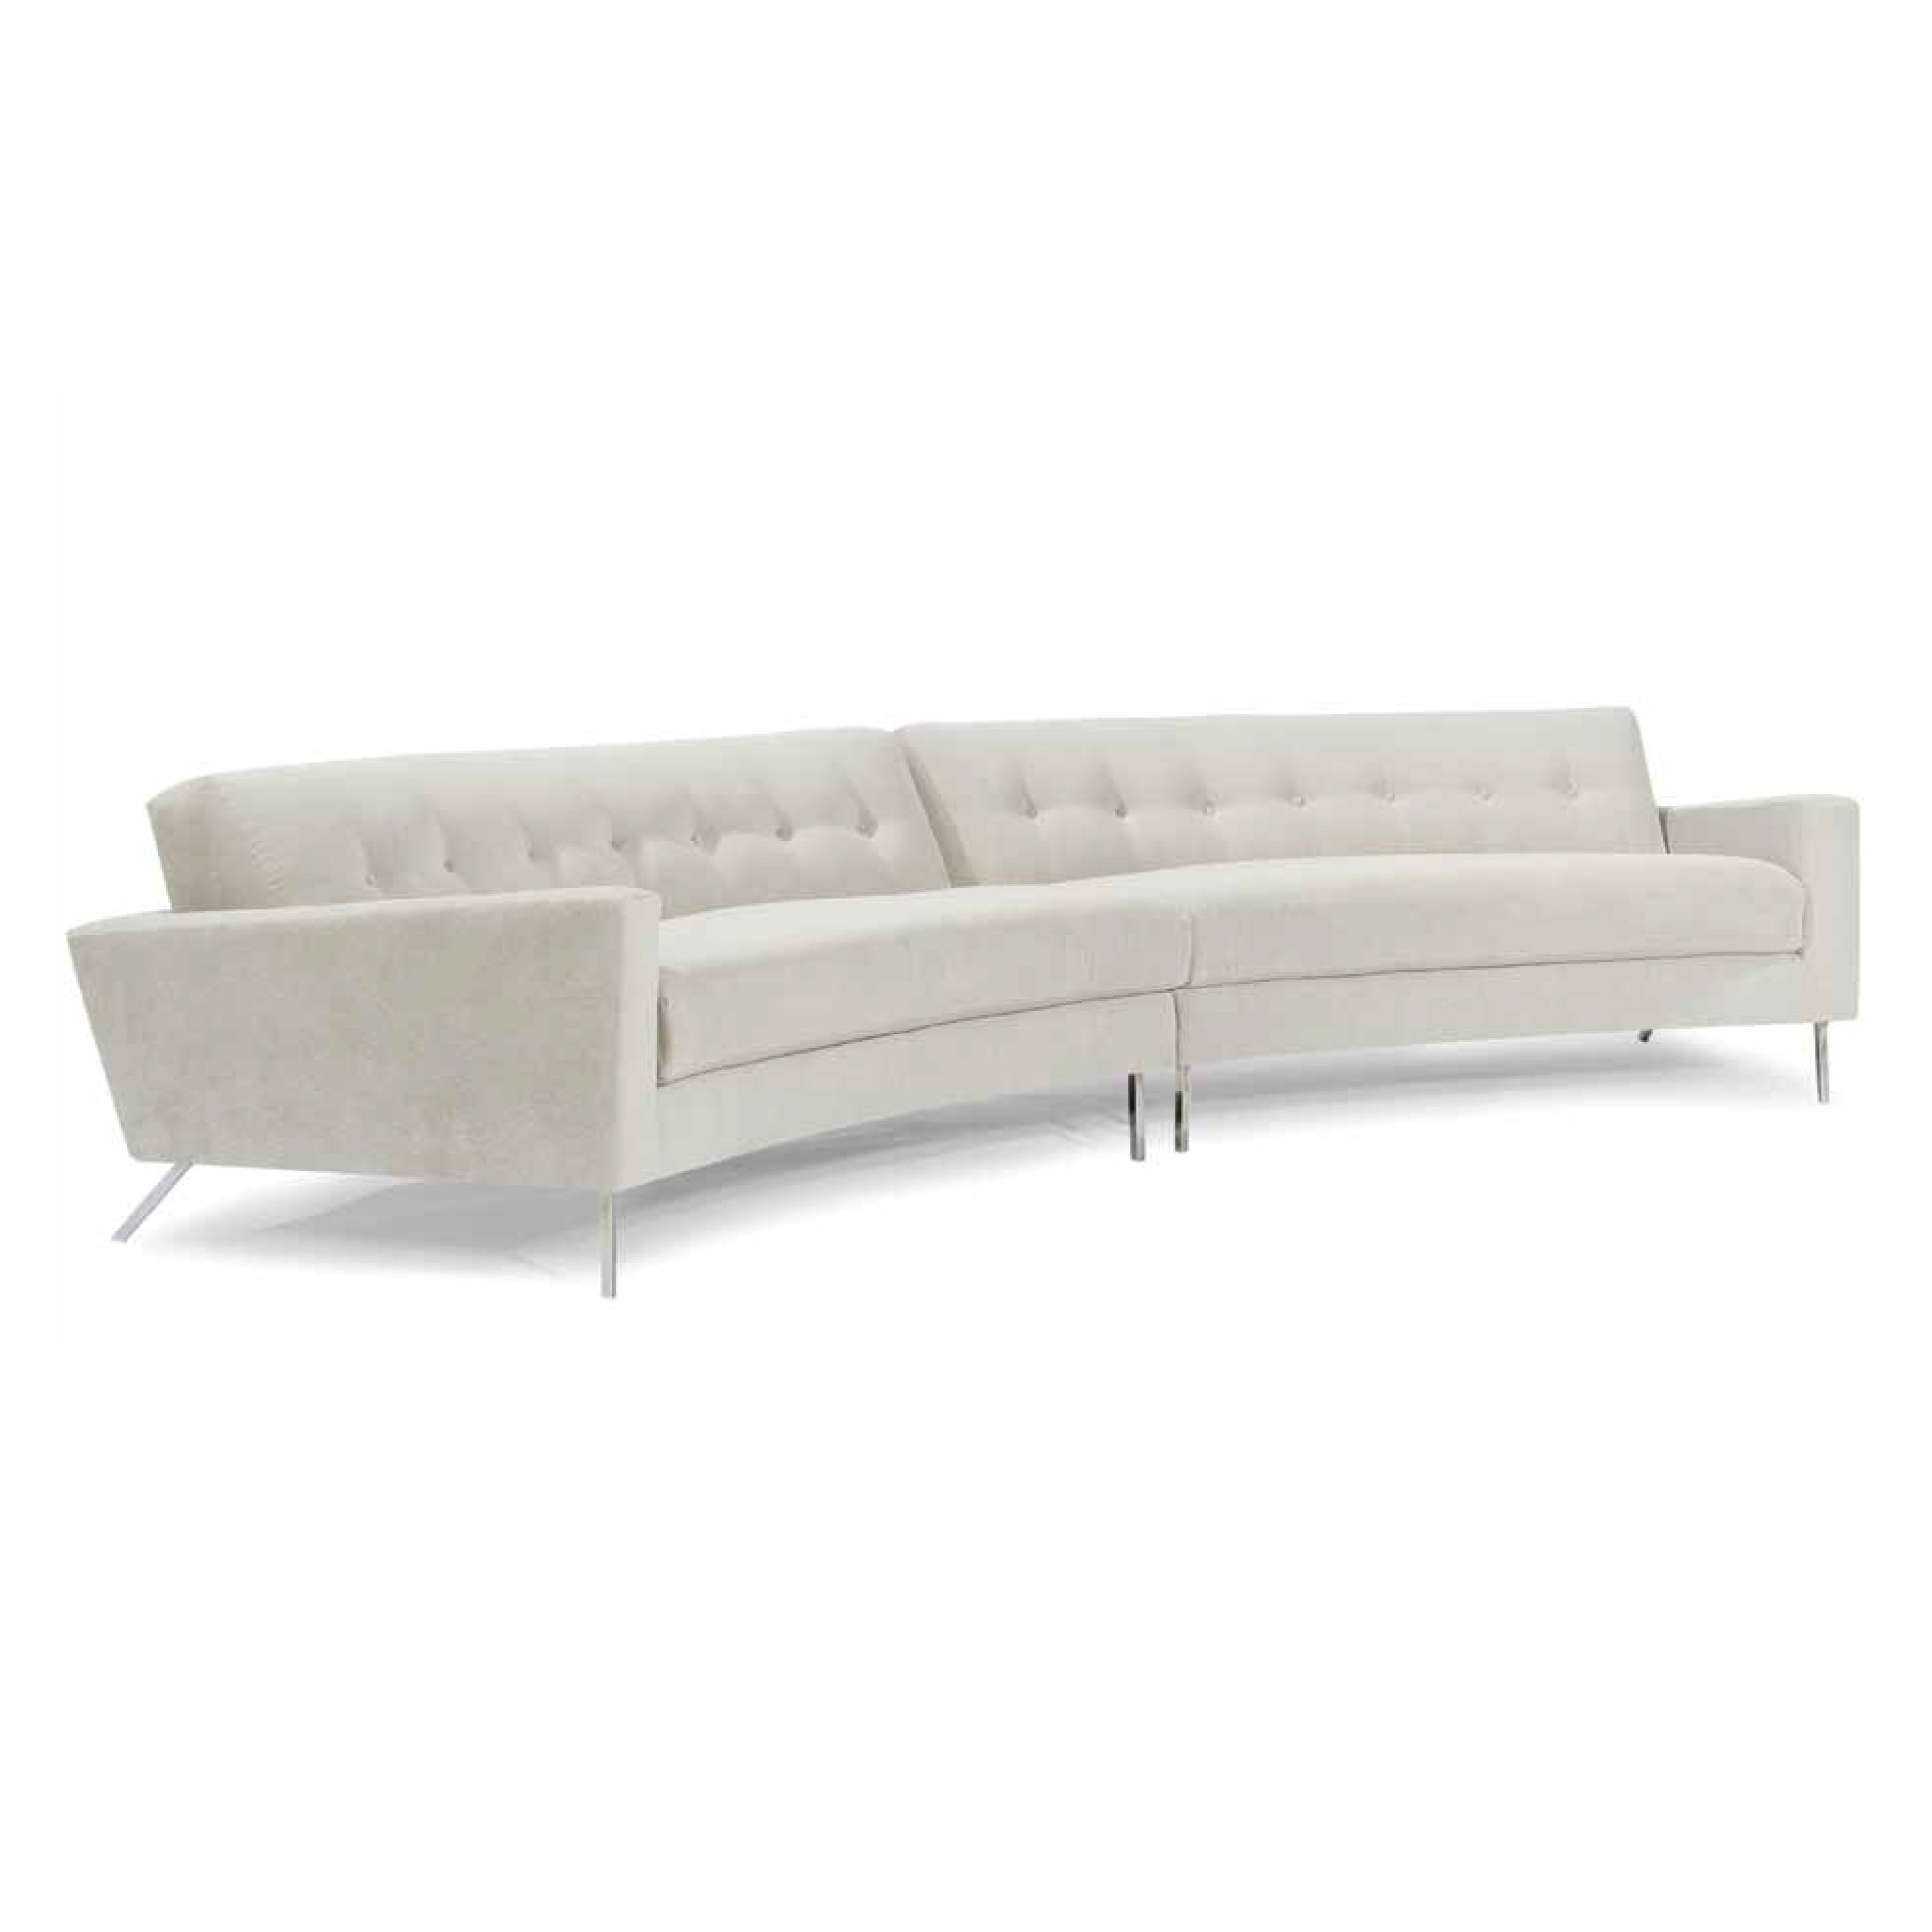 Flamingo Sectional - Lazar   Utah Sofas   Sofa, Curved sofa ...